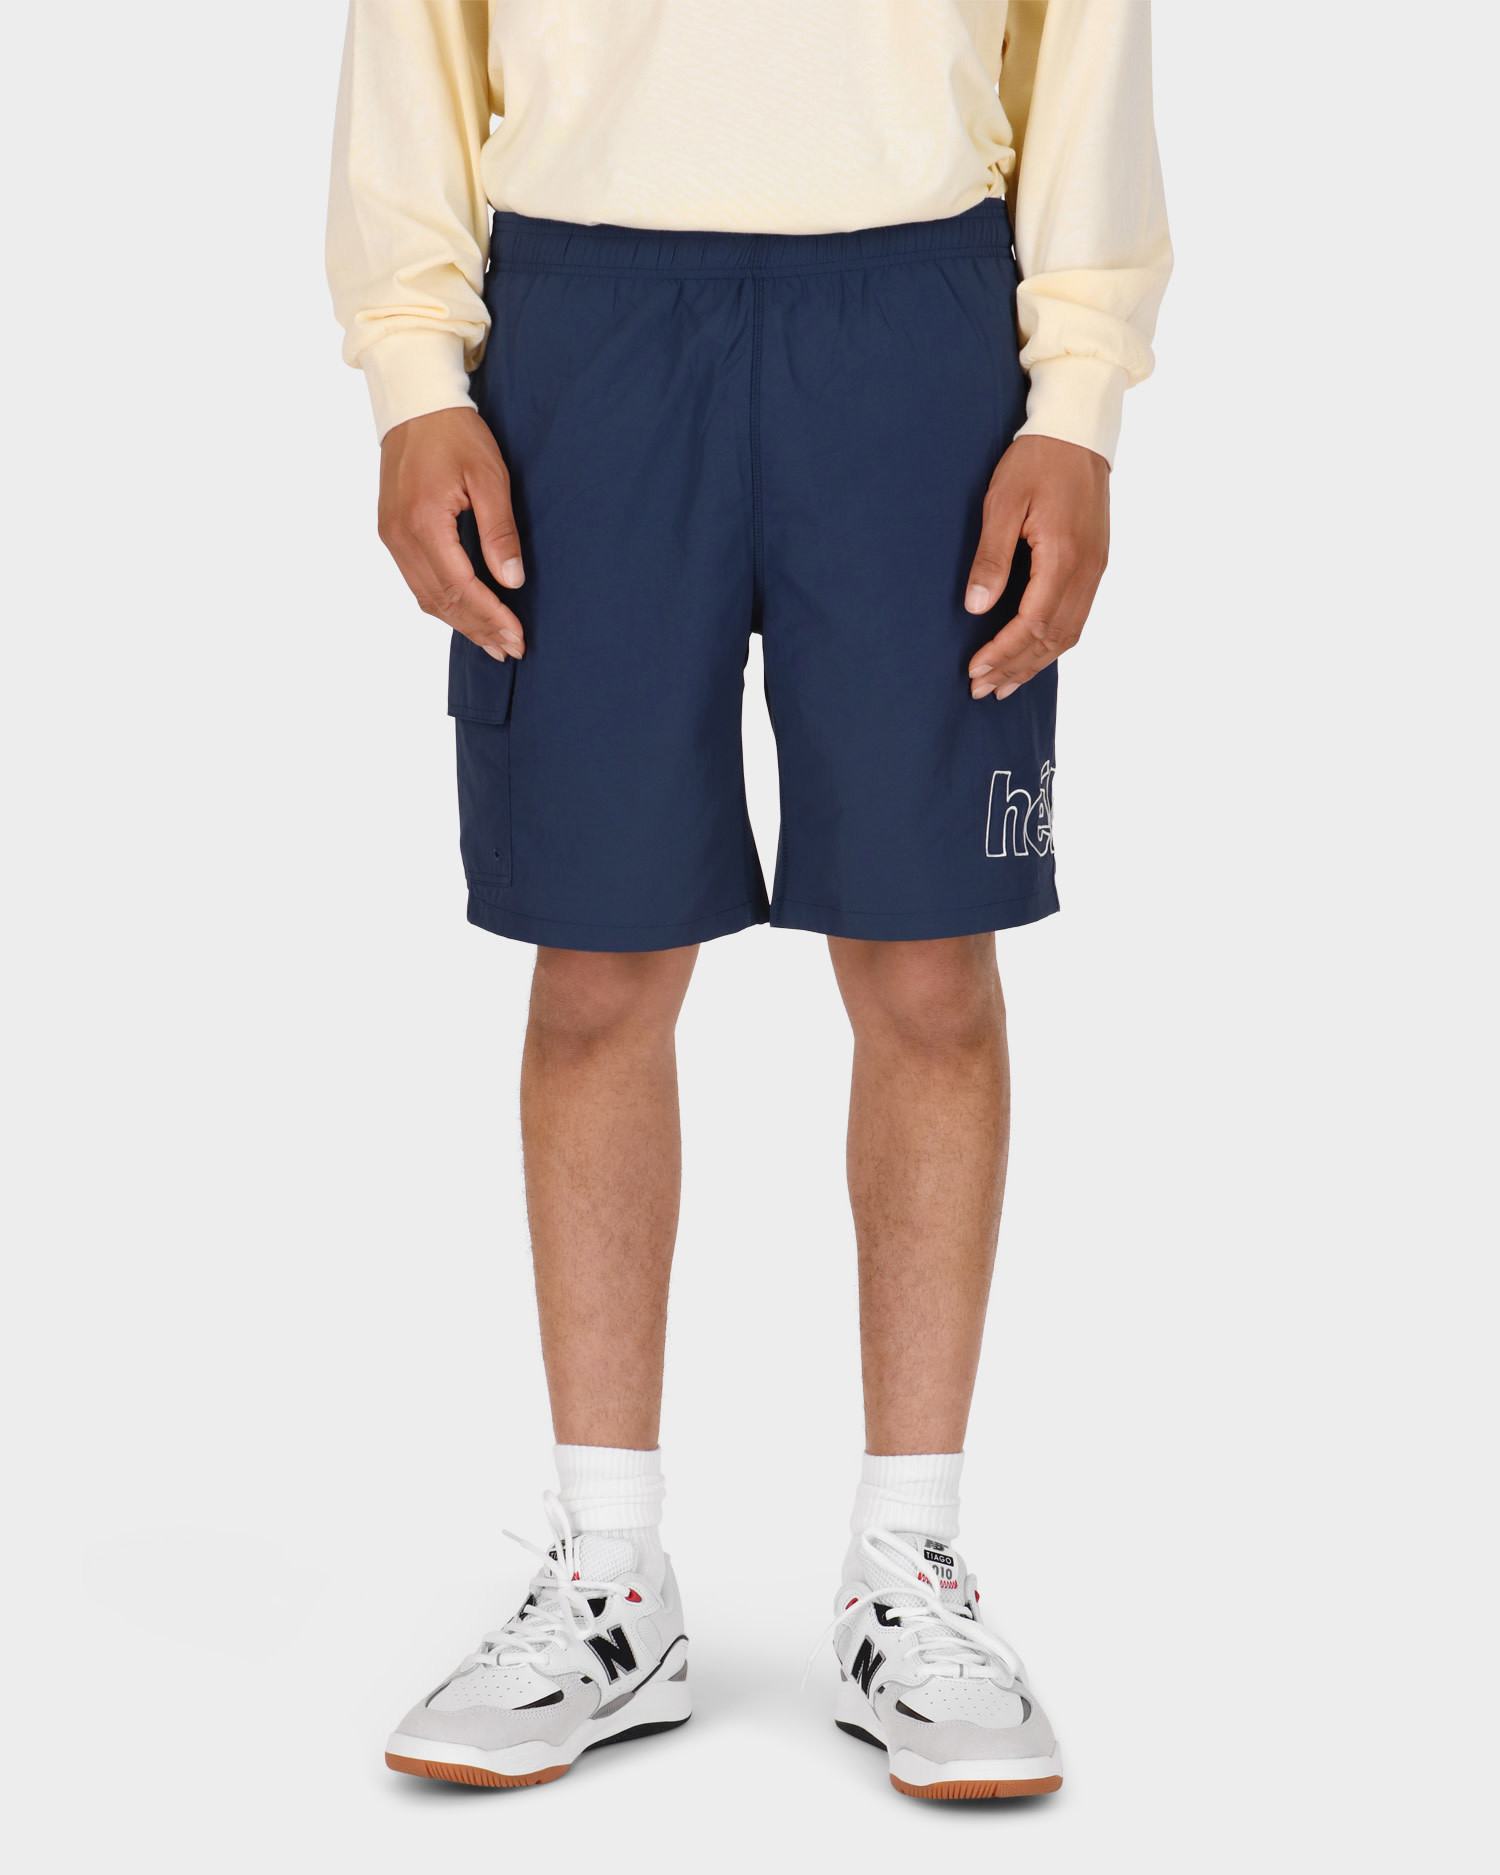 Helas Chroma Shorts Navy